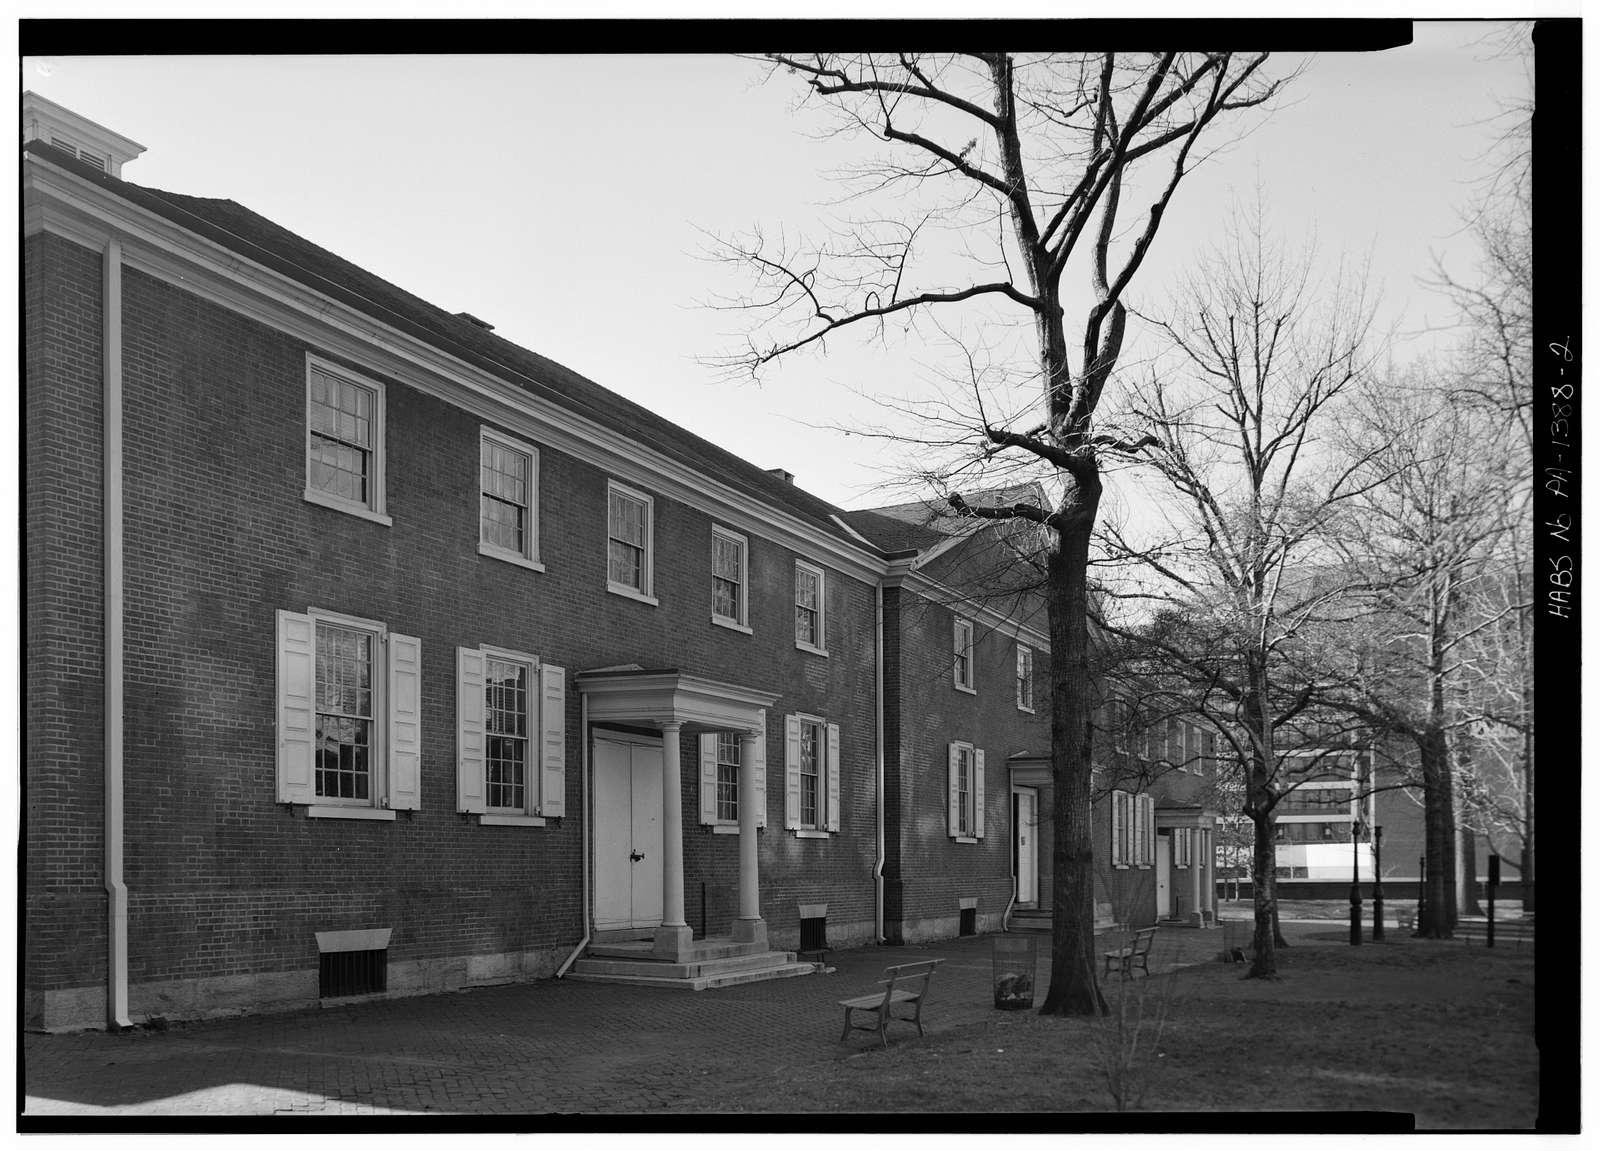 Arch Street Friends Meeting House, 330 Arch Street, Philadelphia, Philadelphia County, PA